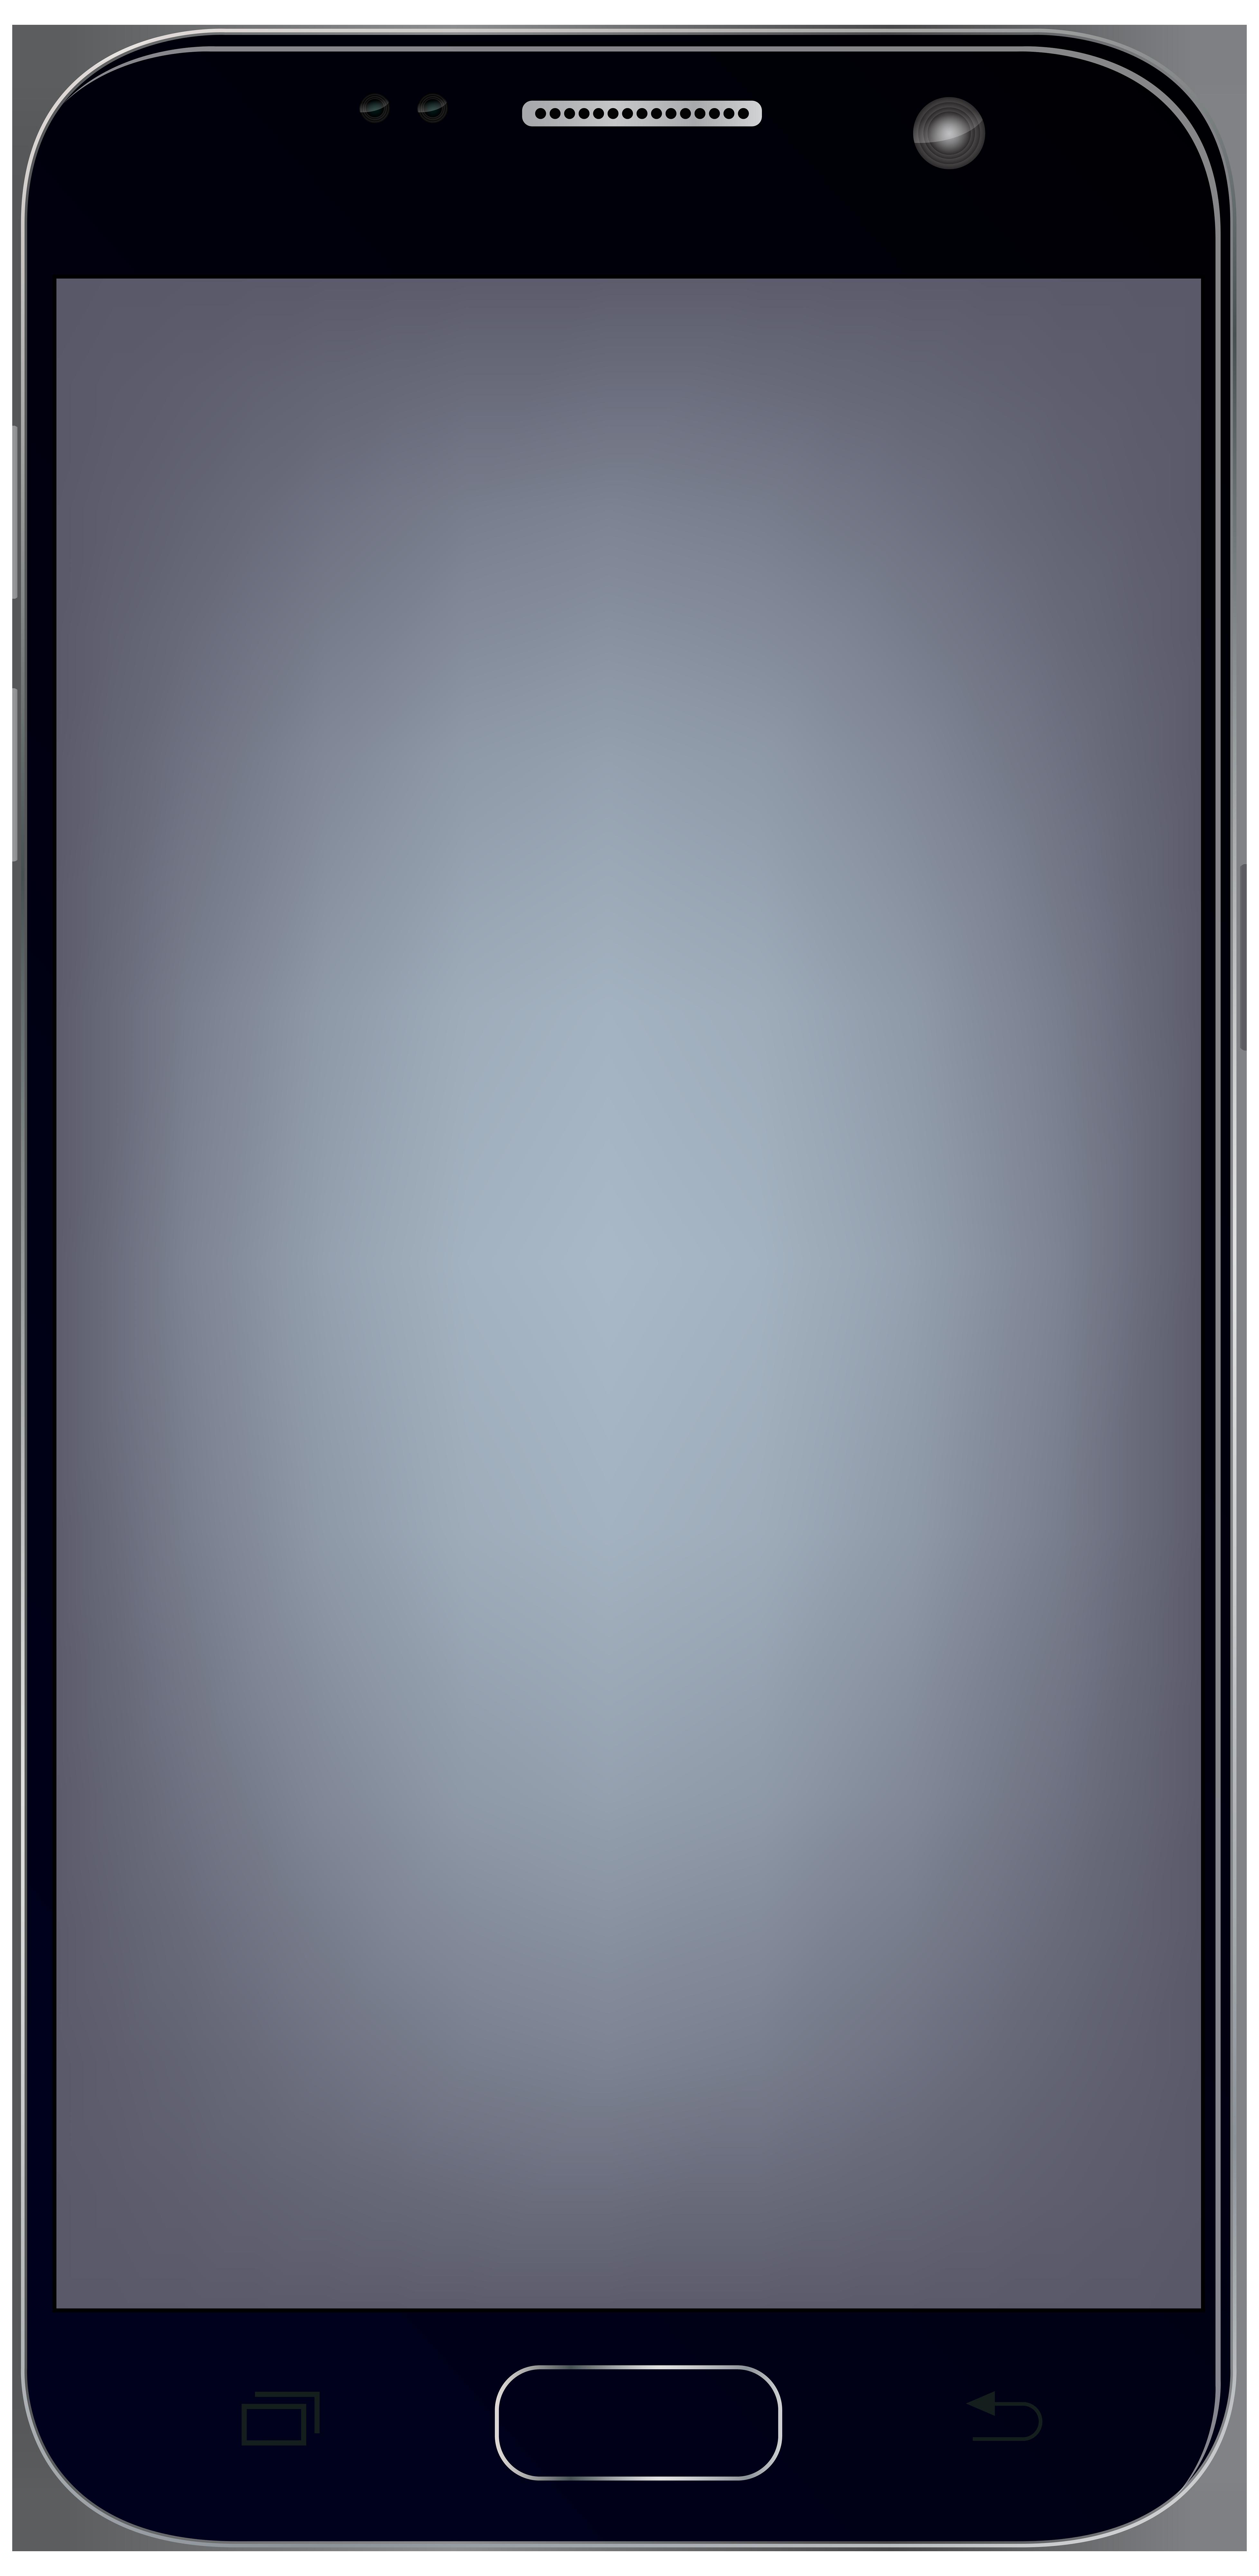 Large Smartphone PNG Clip Art Image.